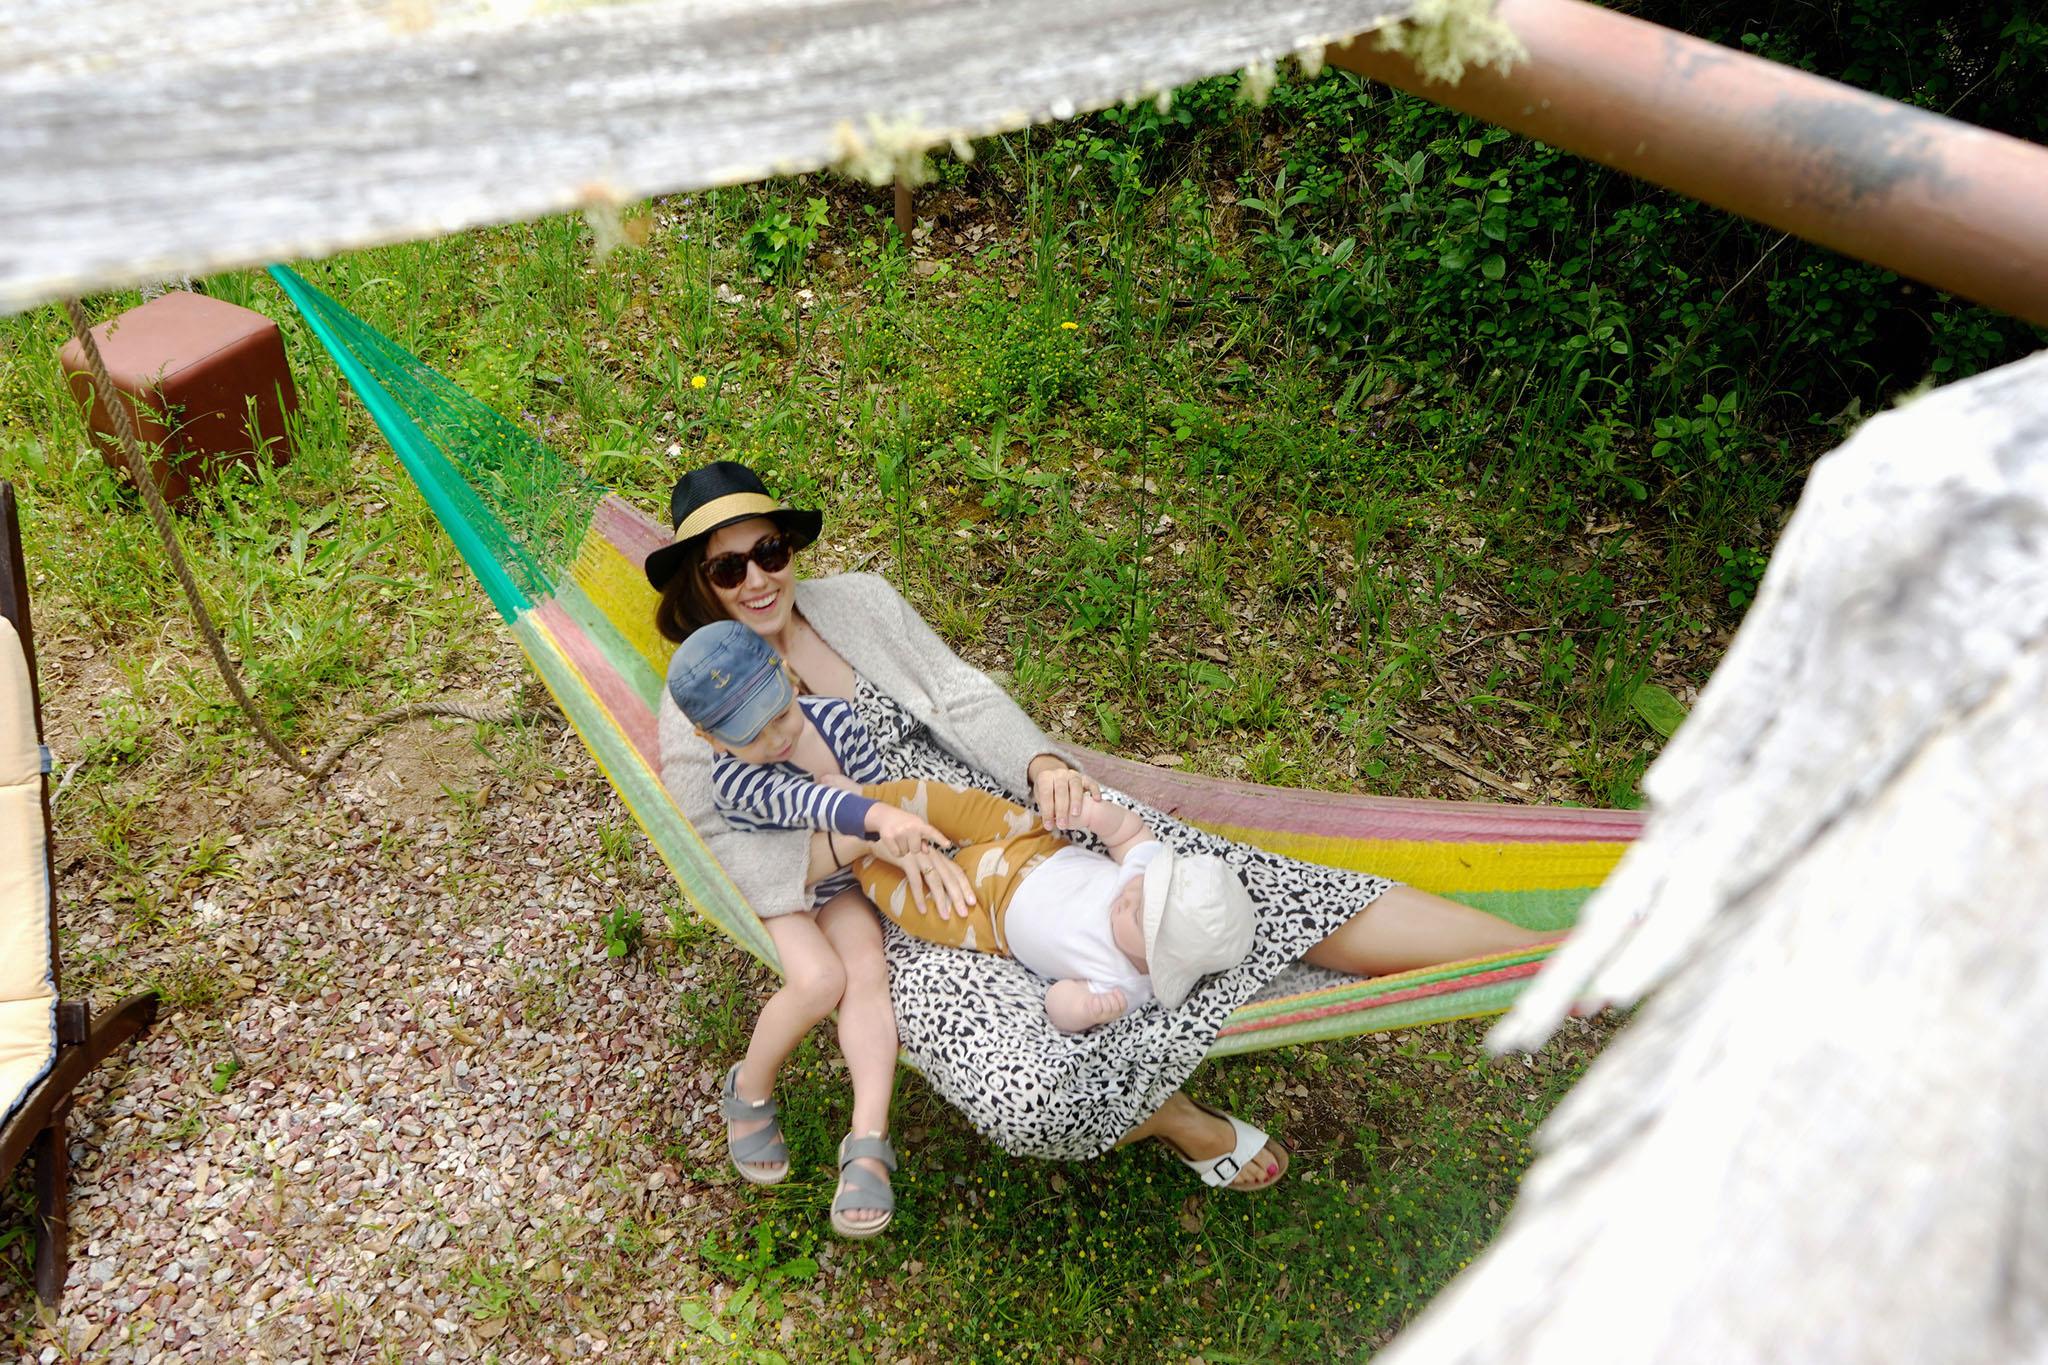 2017-04-Casas-da-Cerca-Portugal - casas-da-cerca-portugal-nectarandpulse-hammock-10.jpg